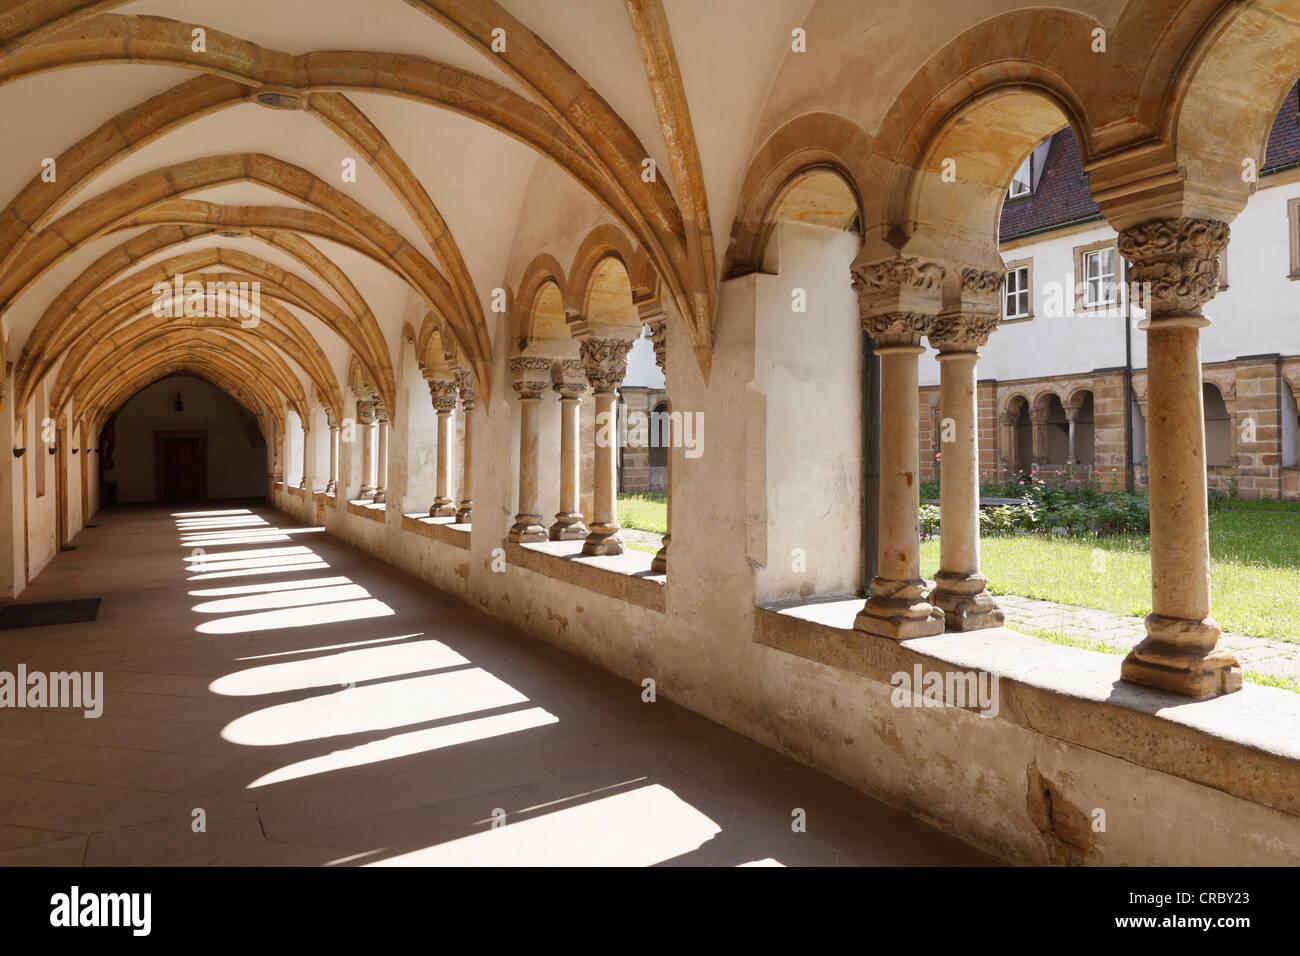 Carmelite Monastery Stock Photos & Carmelite Monastery Stock Images